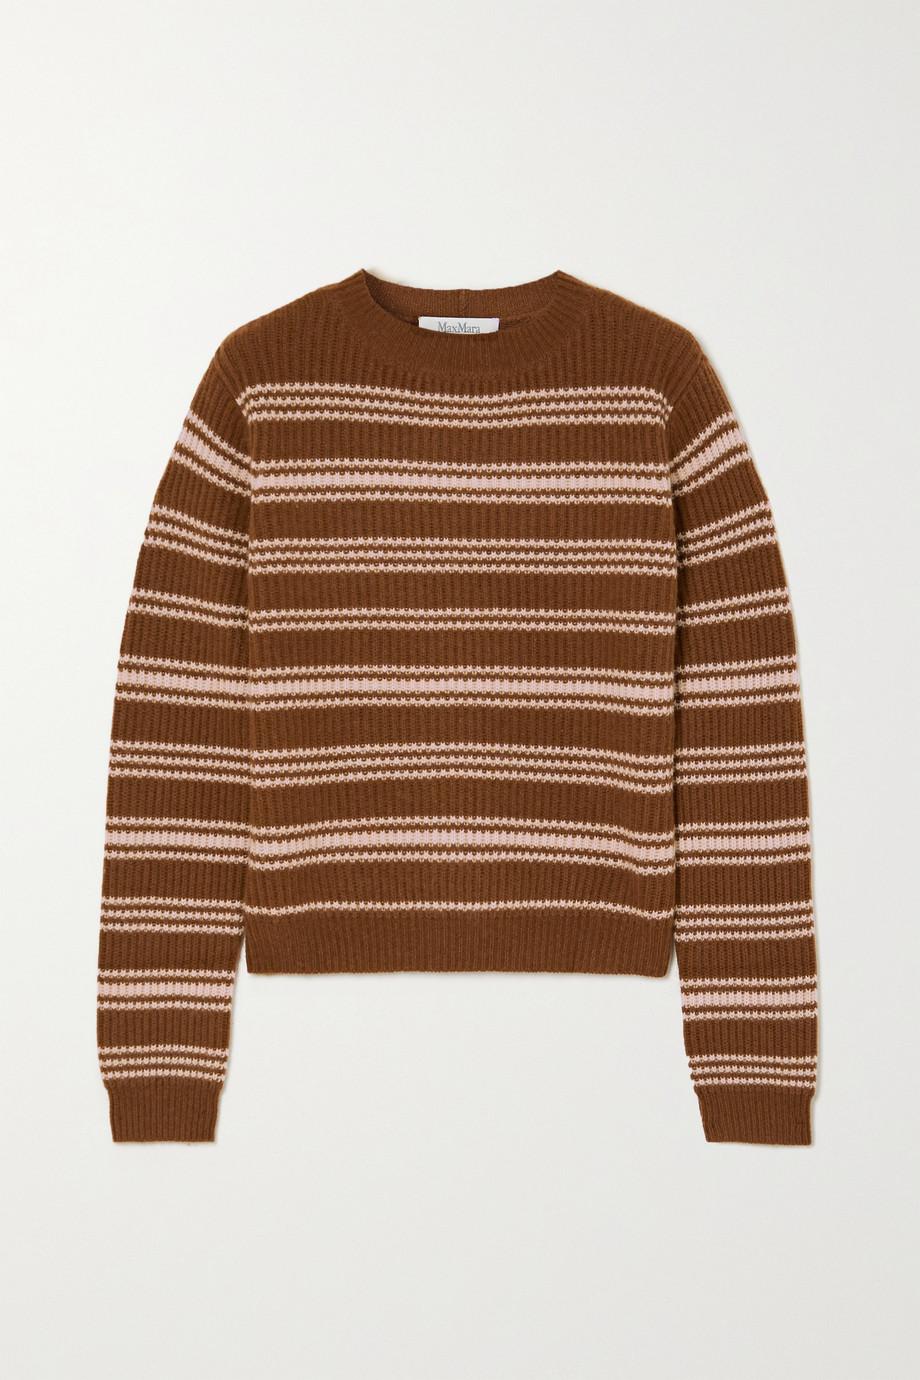 Max Mara Teano gestreifter Pullover aus einer gerippten Woll-Kaschmirmischung